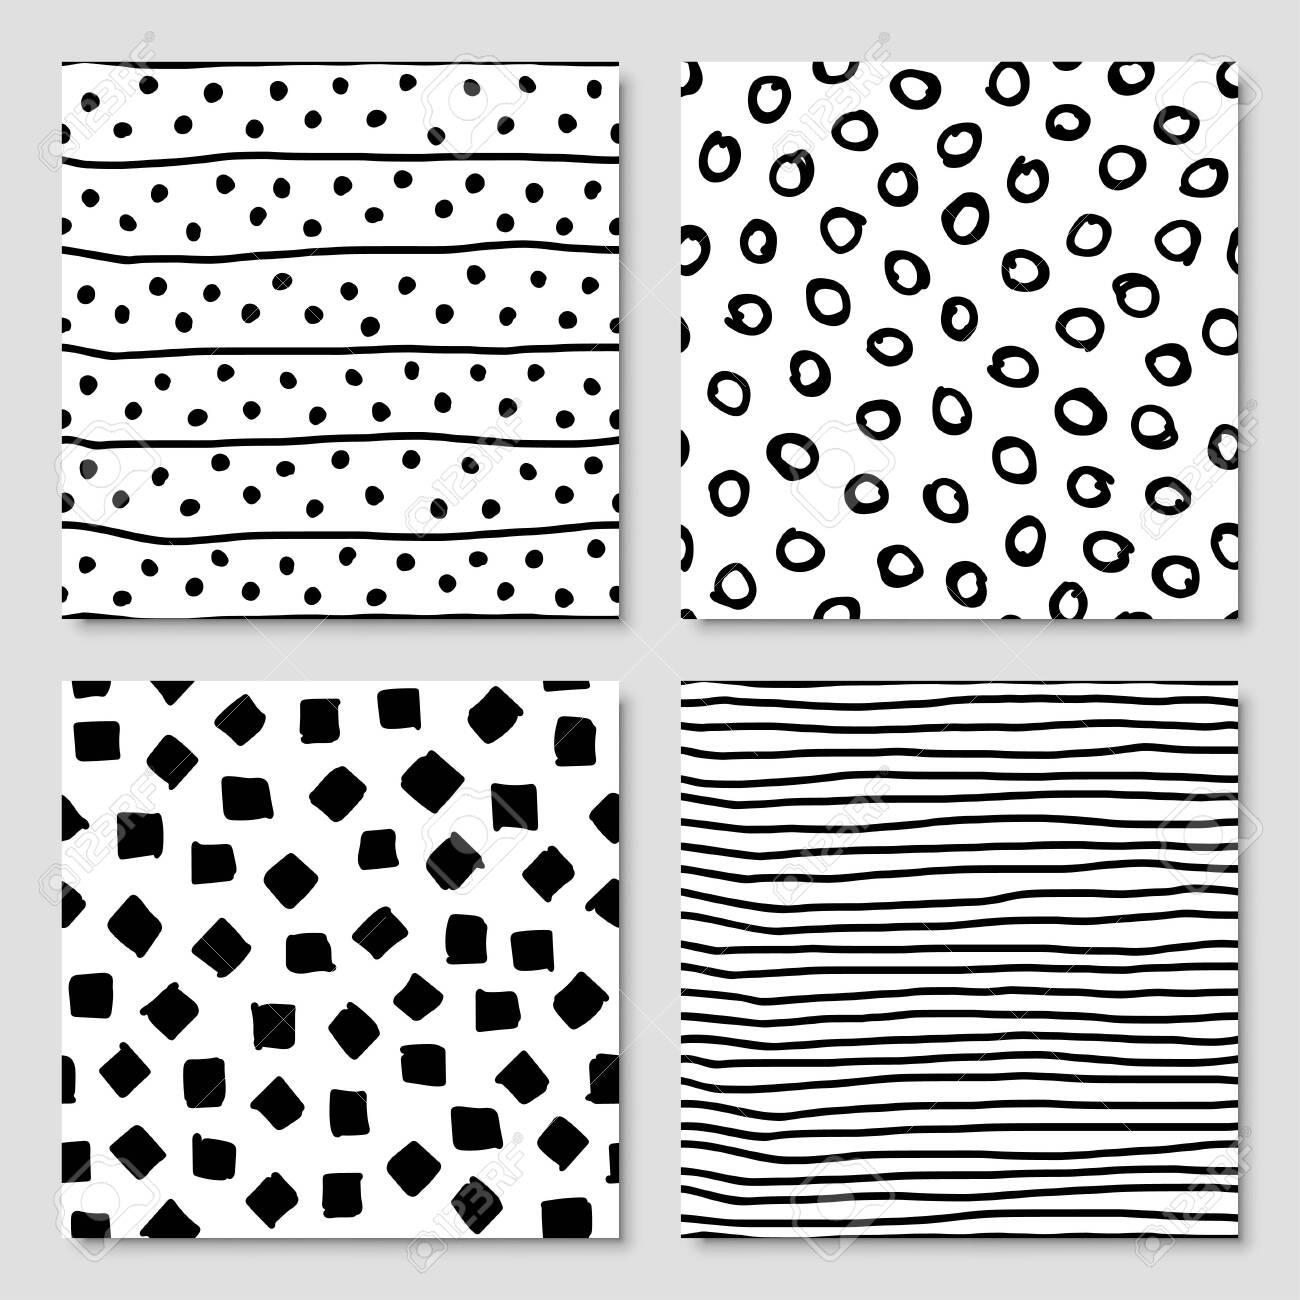 Set of hand drawn ink seamless pattern, vector illustration - 145128115